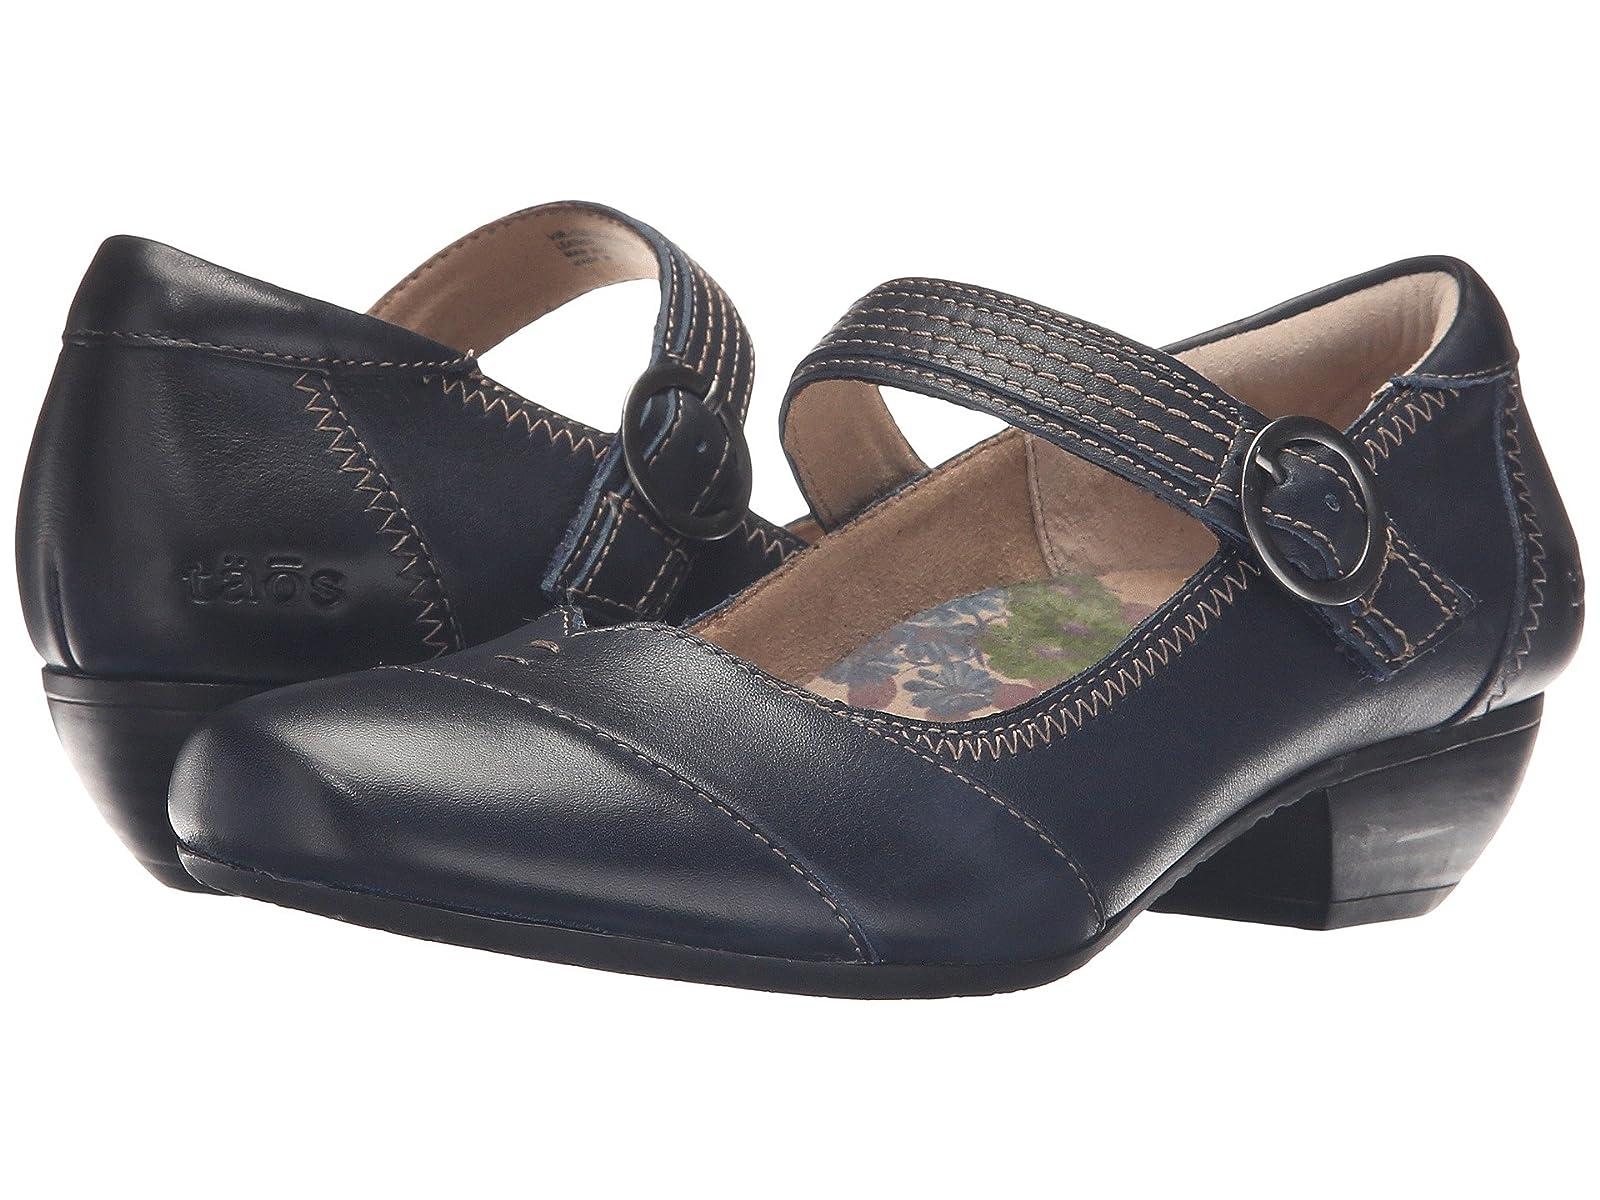 Taos Footwear VirtueAtmospheric grades have affordable shoes